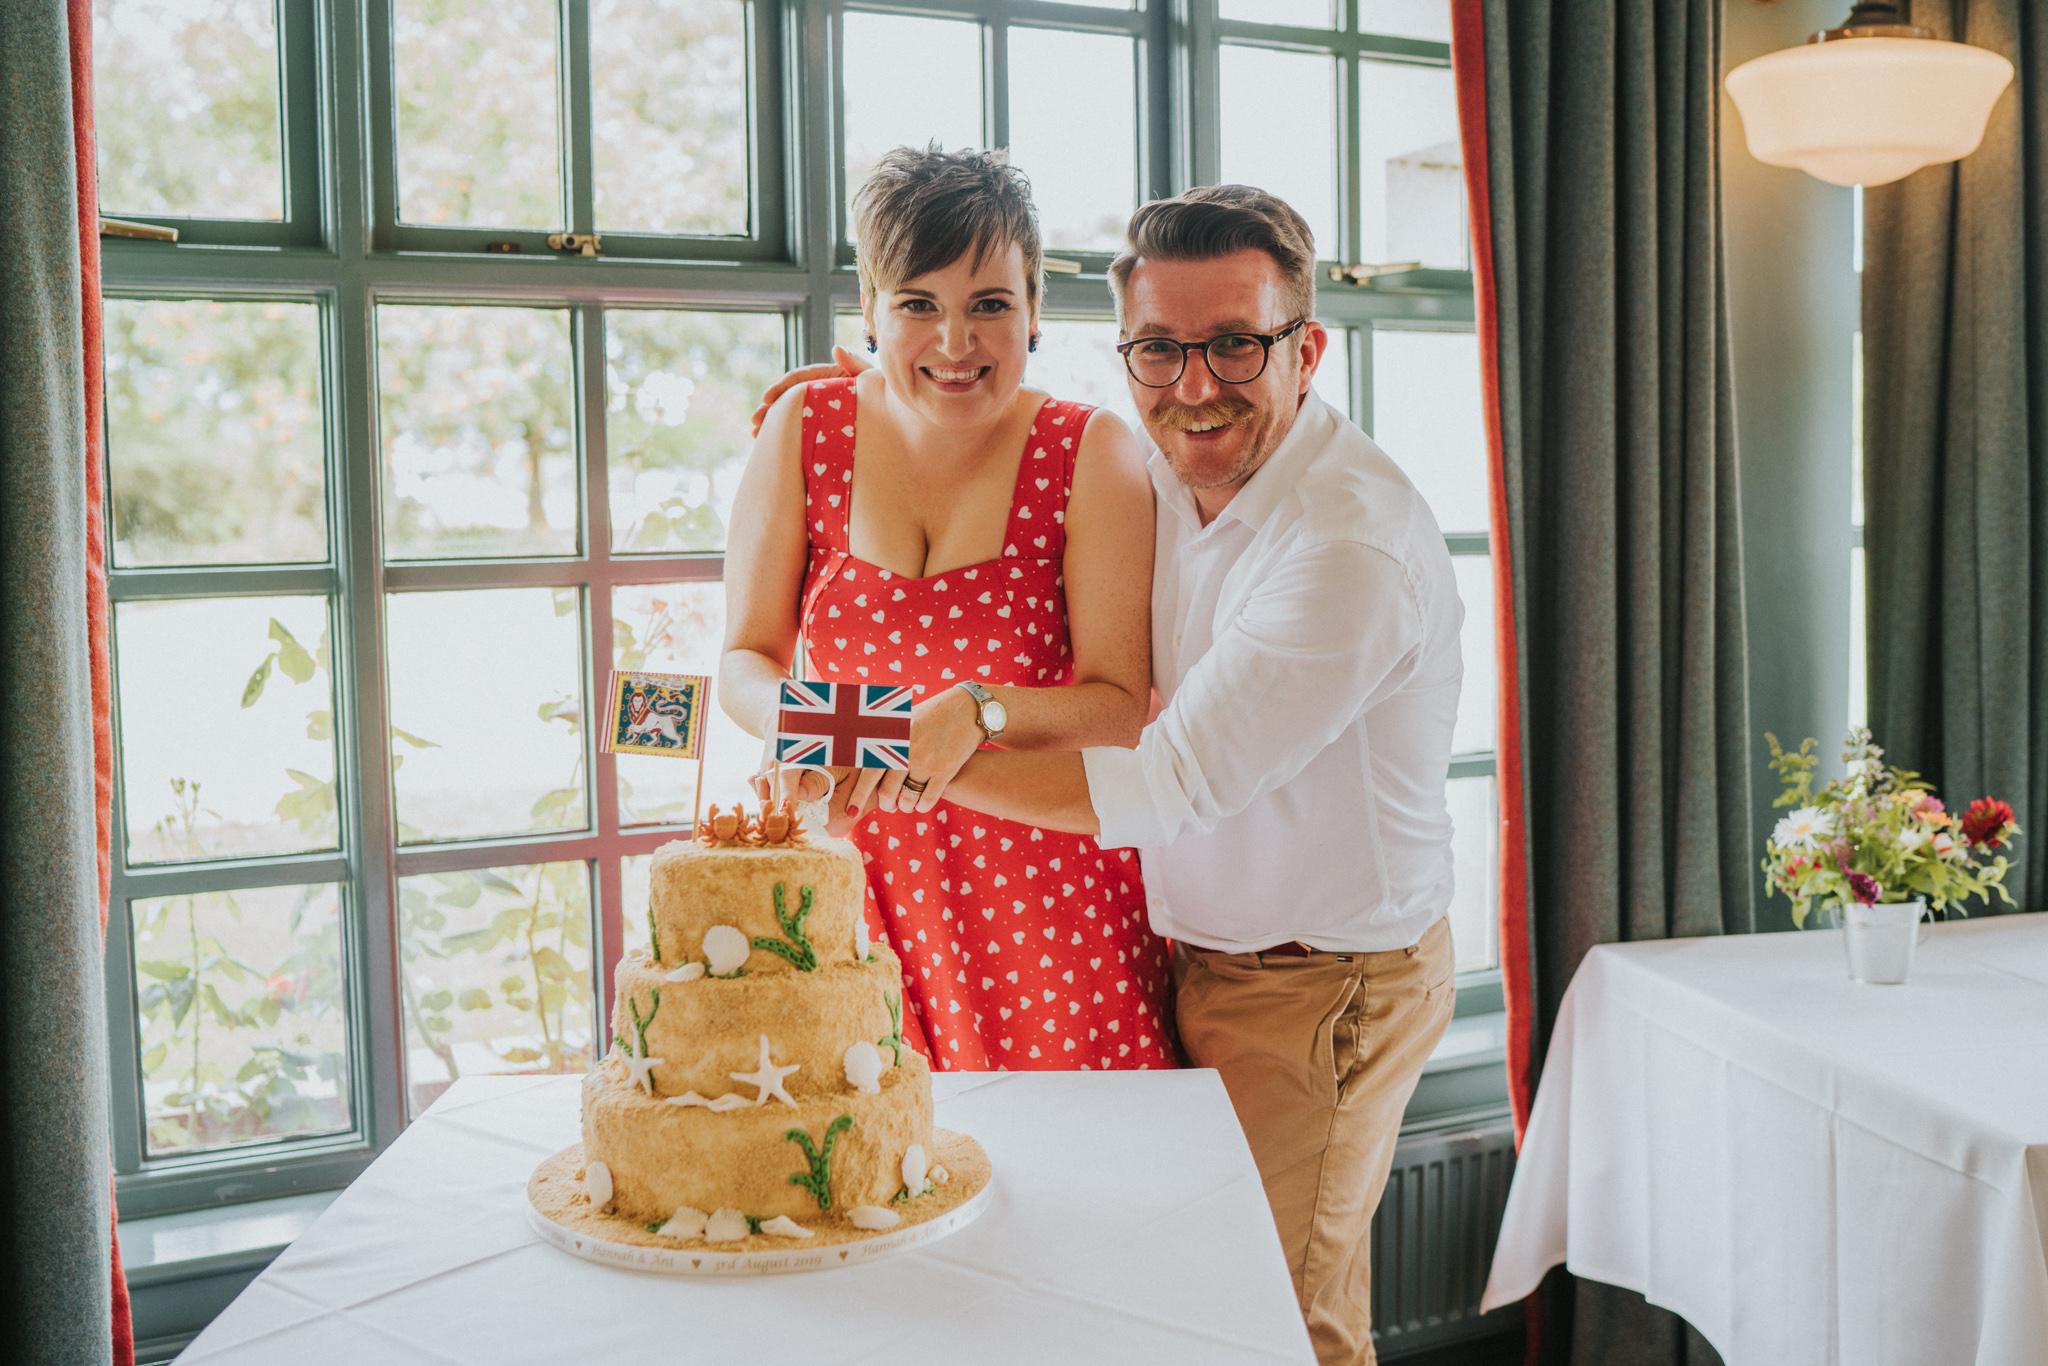 hannah-anthony-thorpeness-retro-diy-50s-wedding-grace-elizabeth-colchester-essex-alternative-wedding-lifestyle-photographer-essex-suffolk-norfolk-devon (30 of 39).jpg